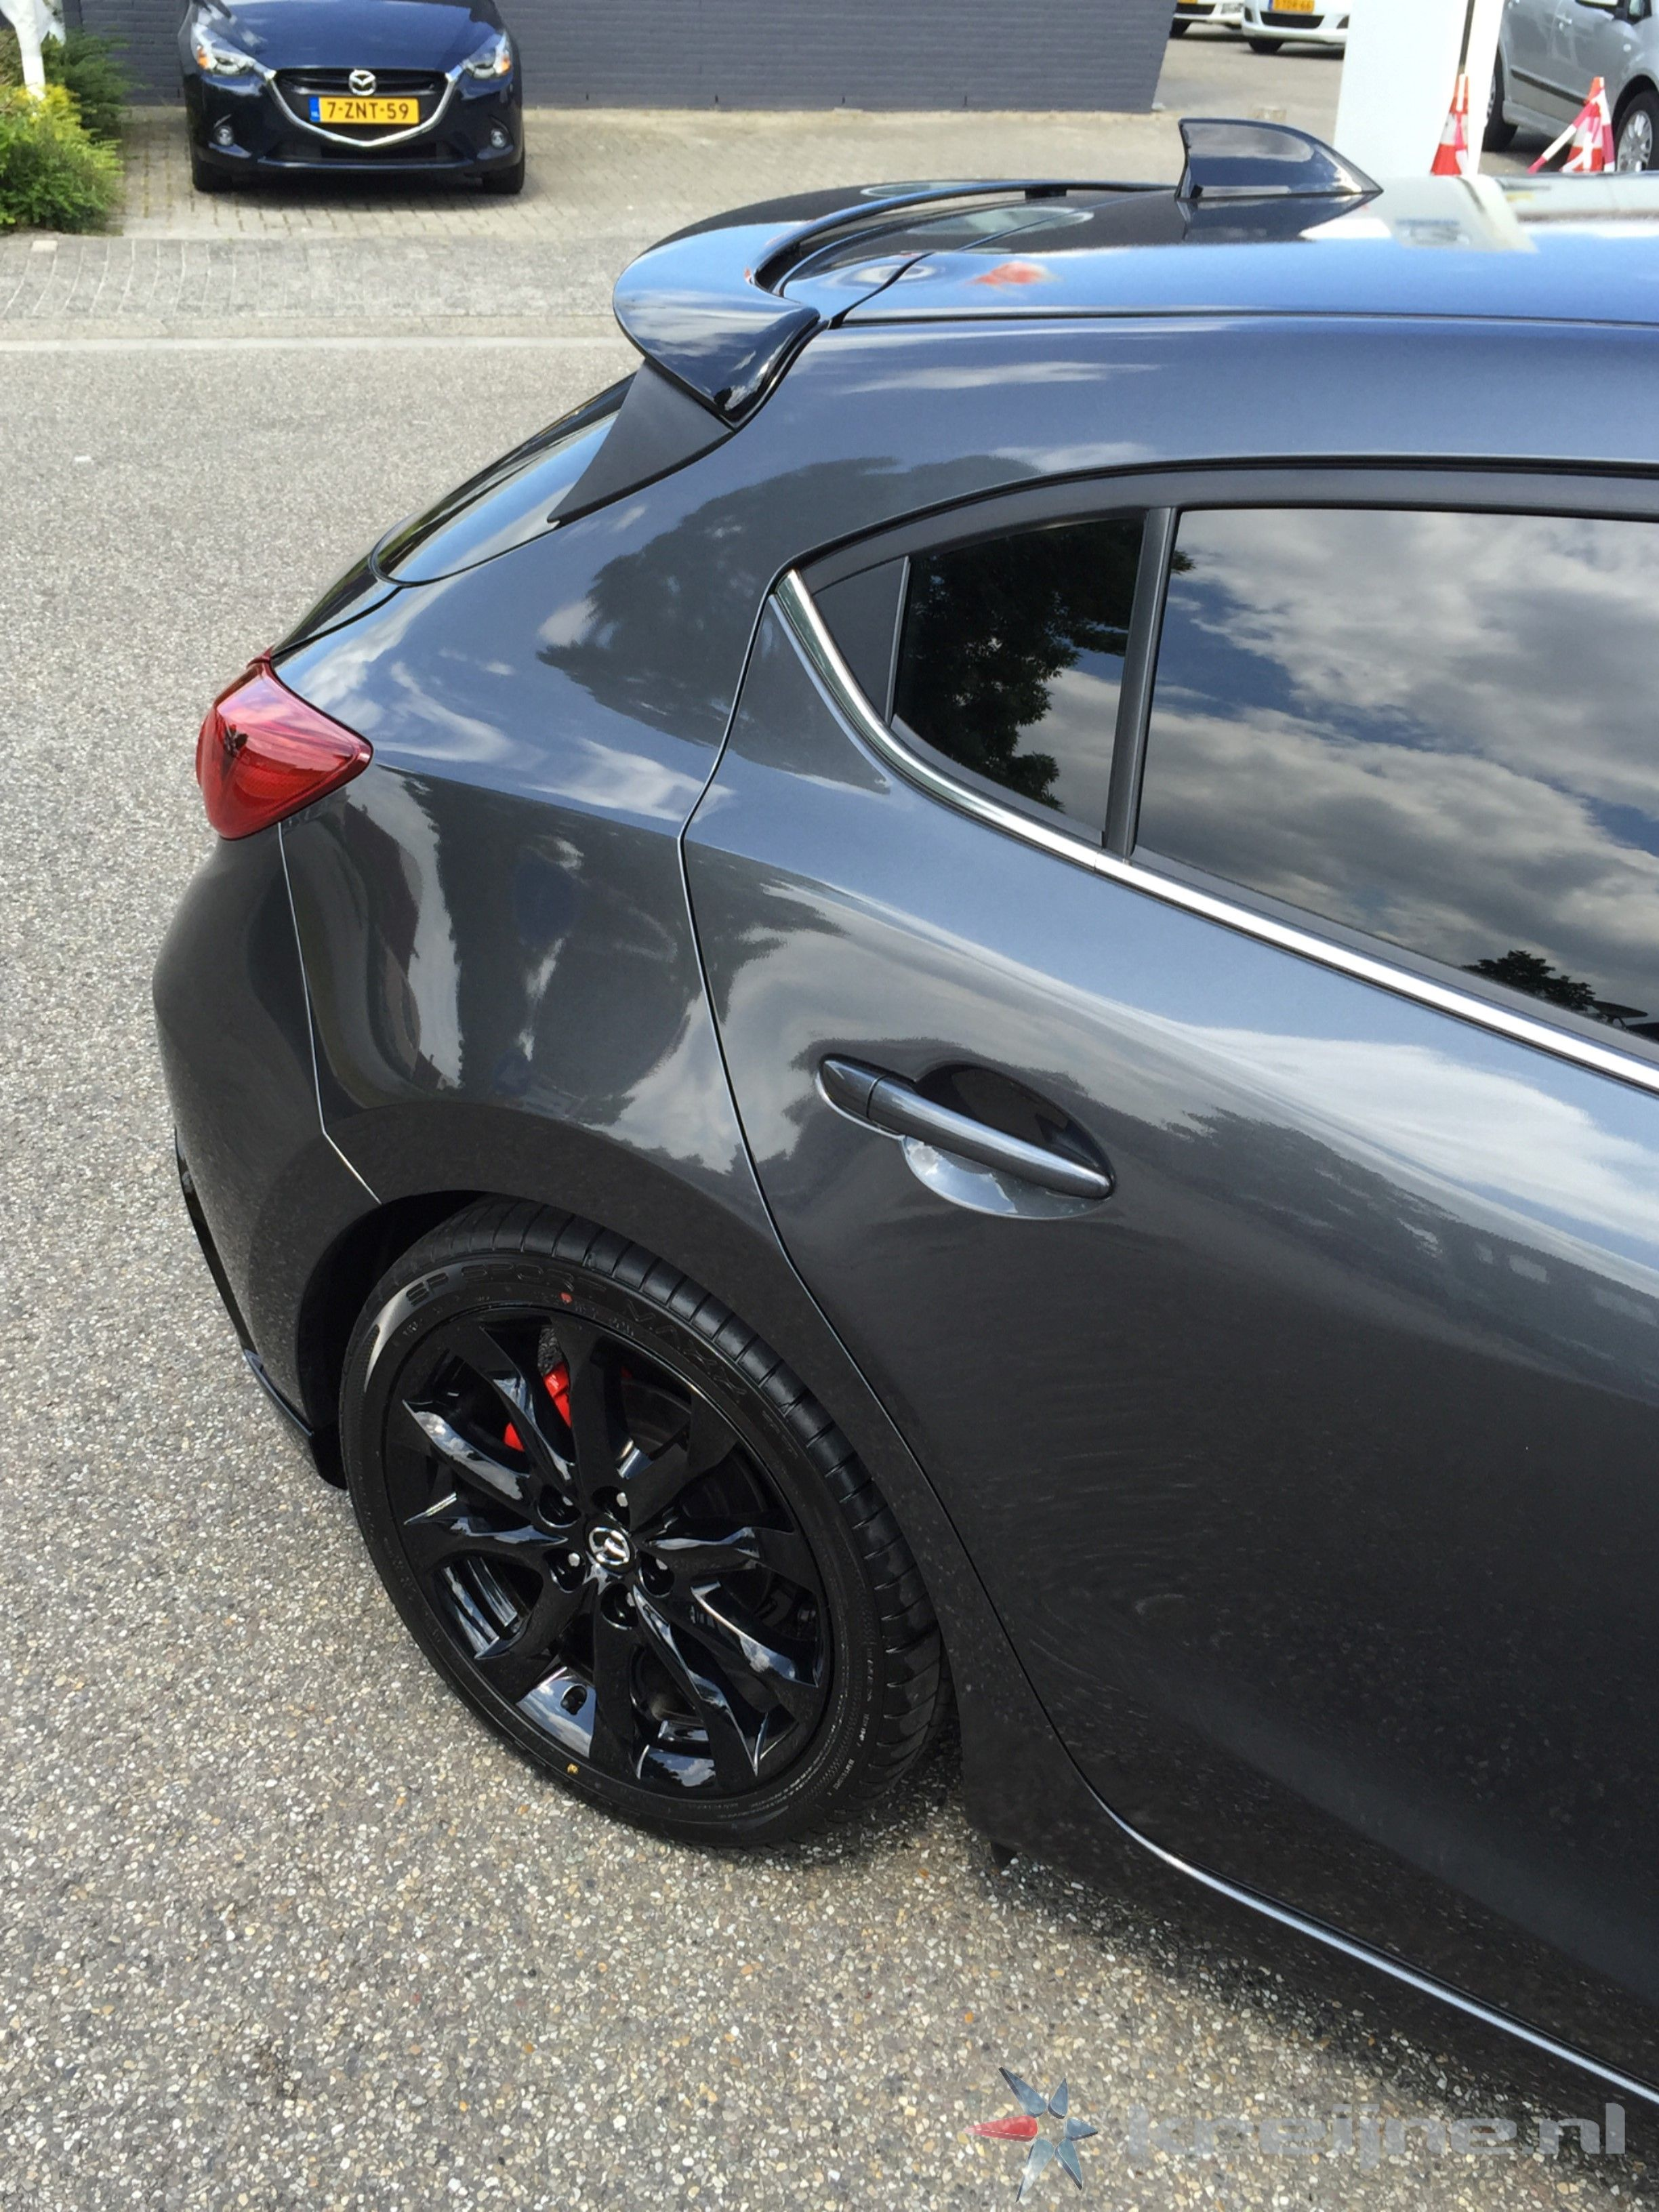 Pin By Heather Smith On Mazda 3 Meteor Grey Black Mazda 3 Hatchback Mazda 3 Sport Mazda 3